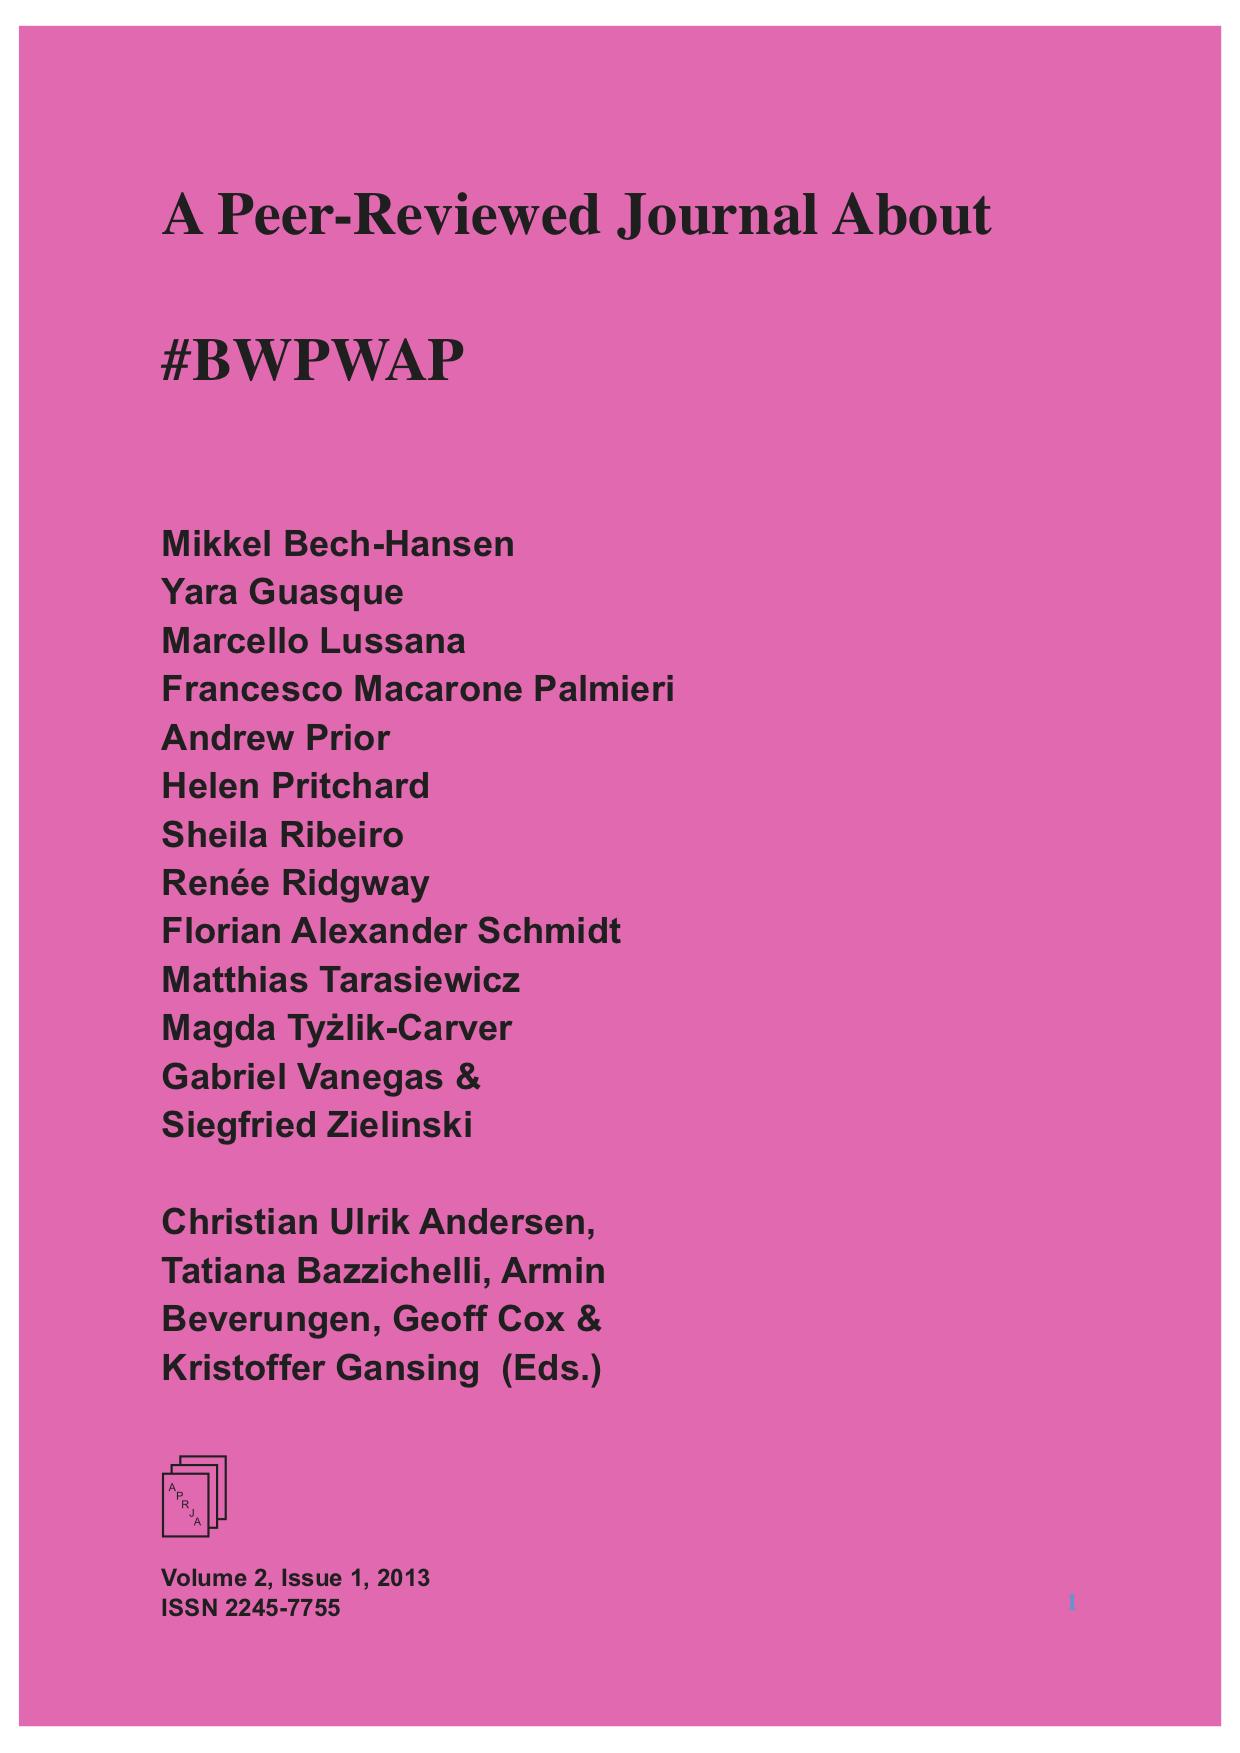 #BWPWAP